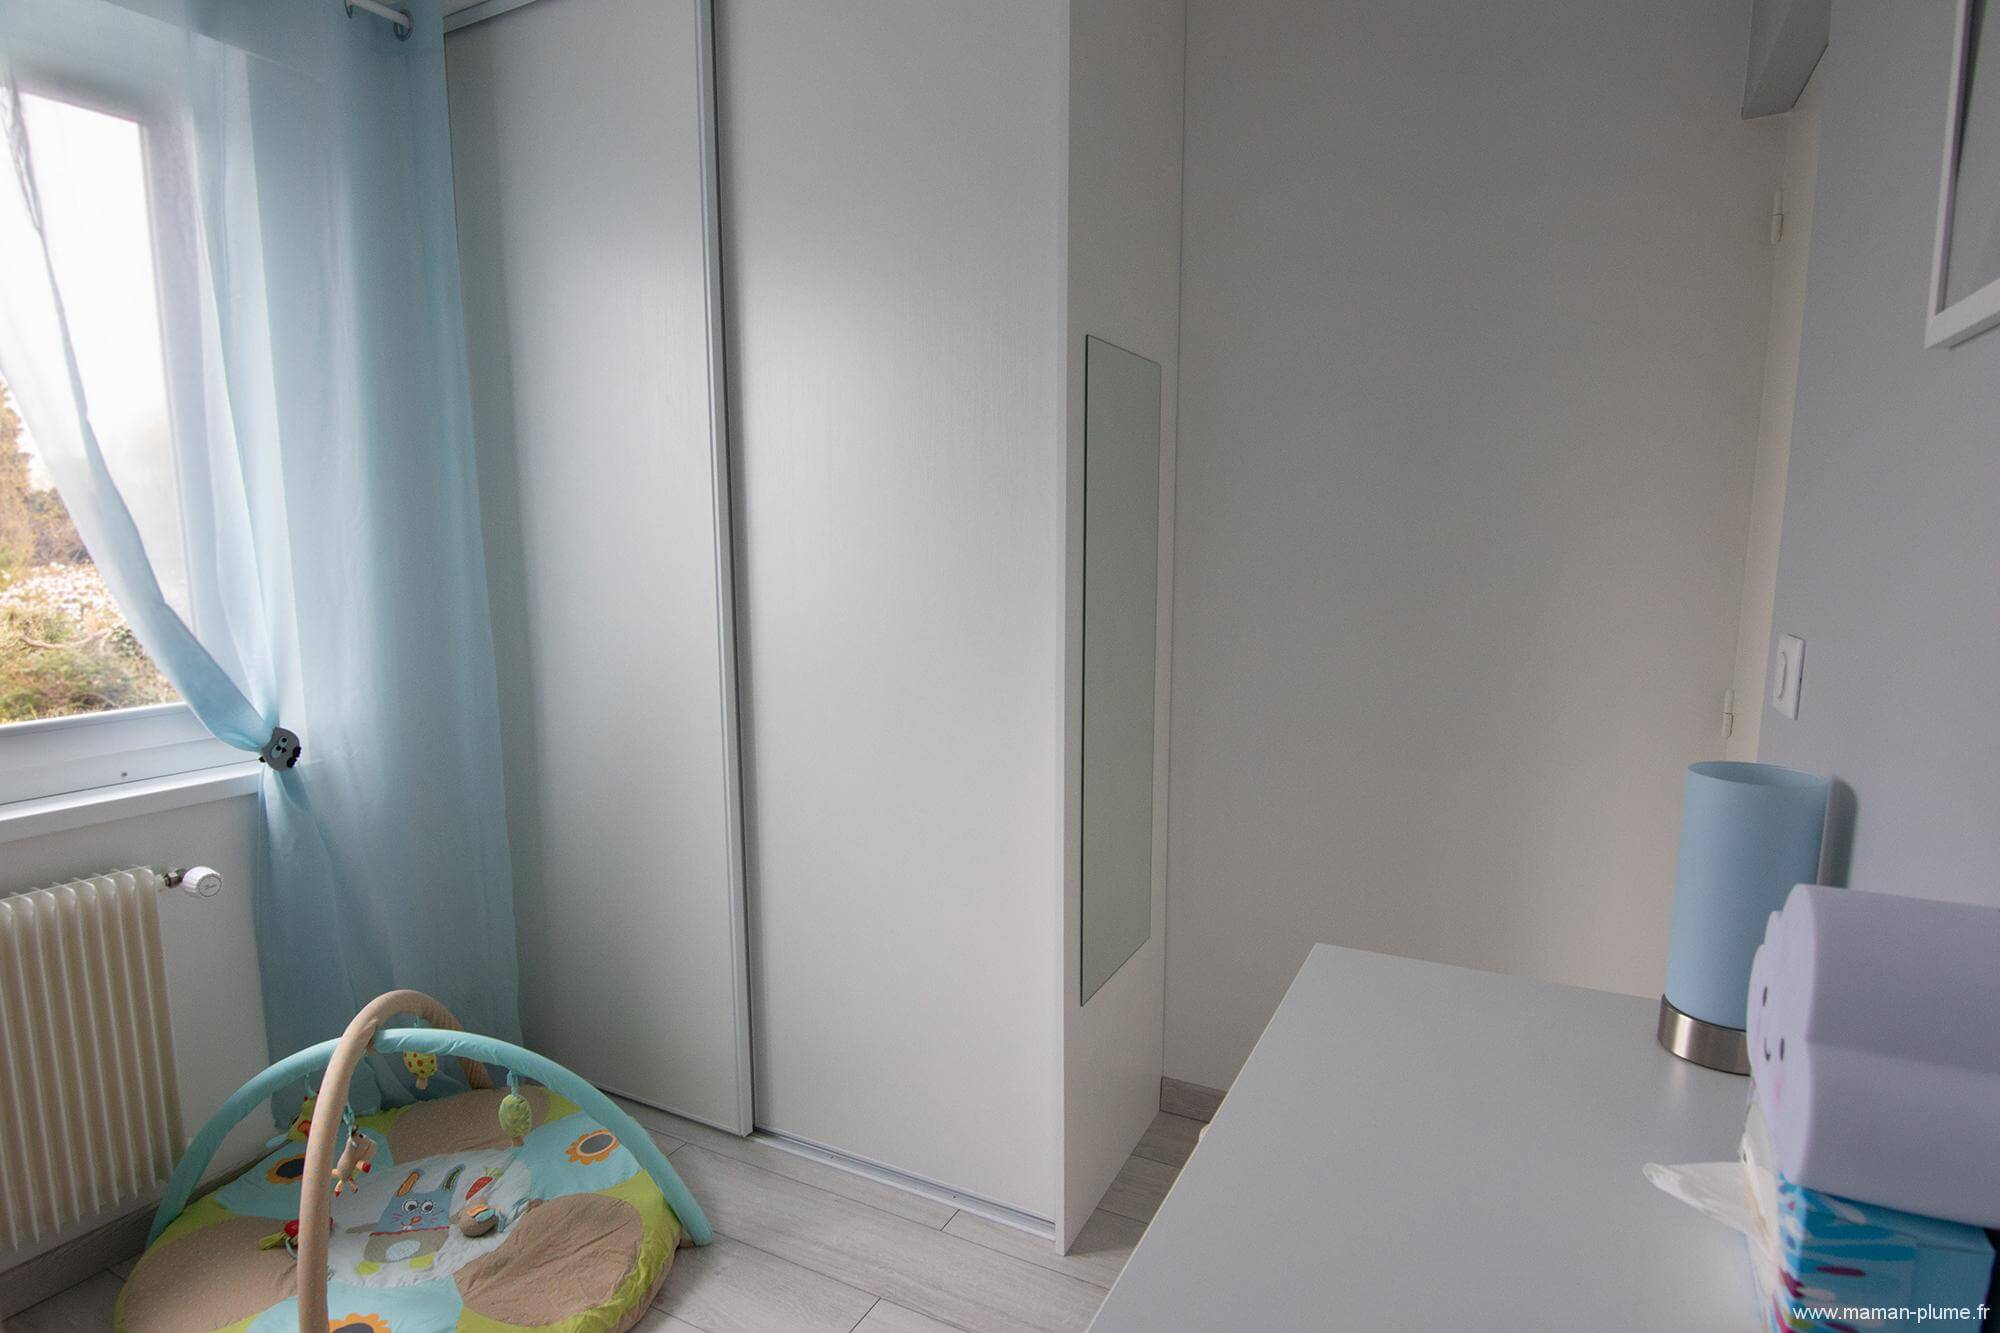 visite chambre b b gar on room tour tapis le blog de maman plume. Black Bedroom Furniture Sets. Home Design Ideas